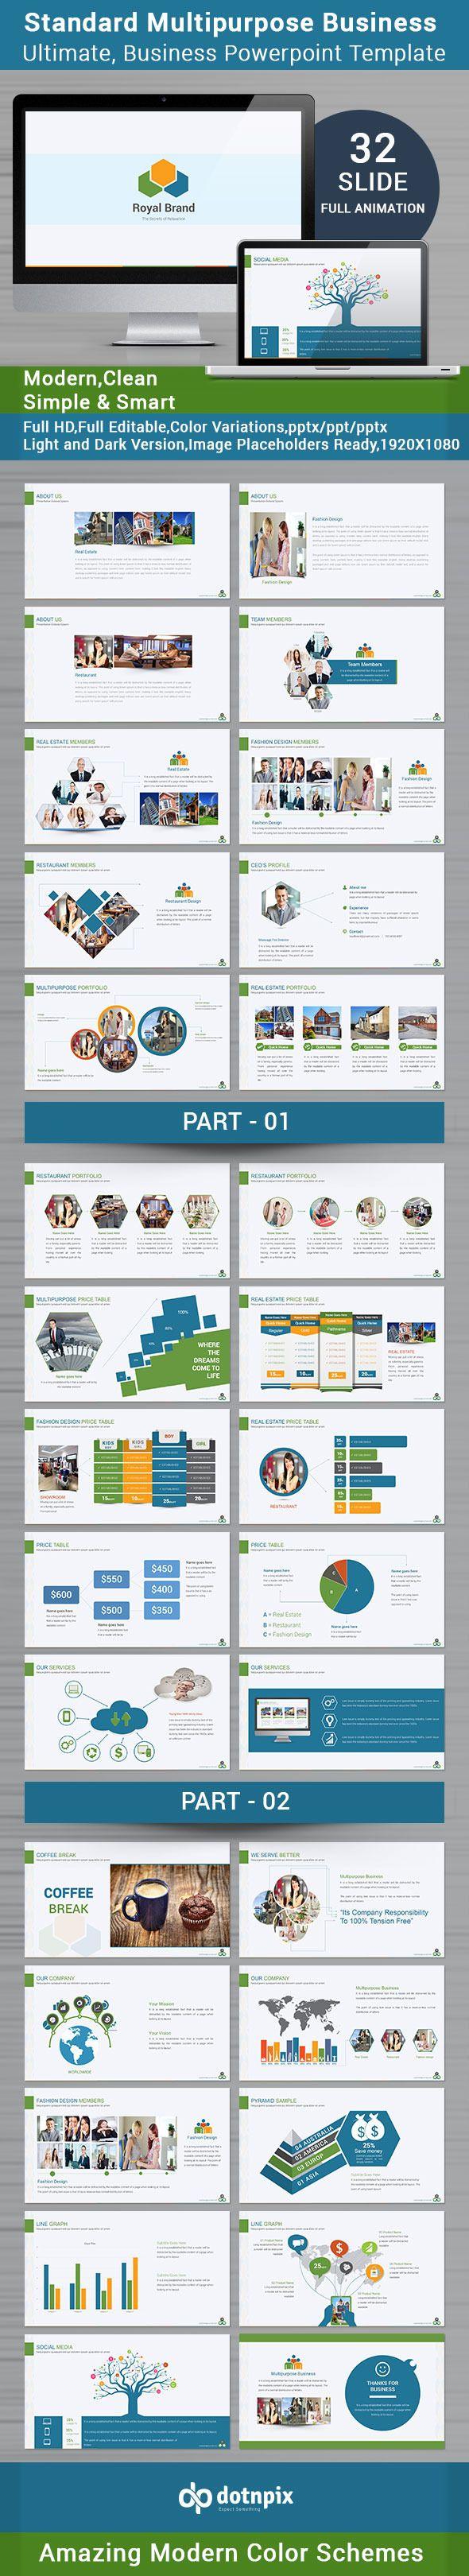 Standard Multipurpose Business Powerpoint Template (PowerPoint Templates)